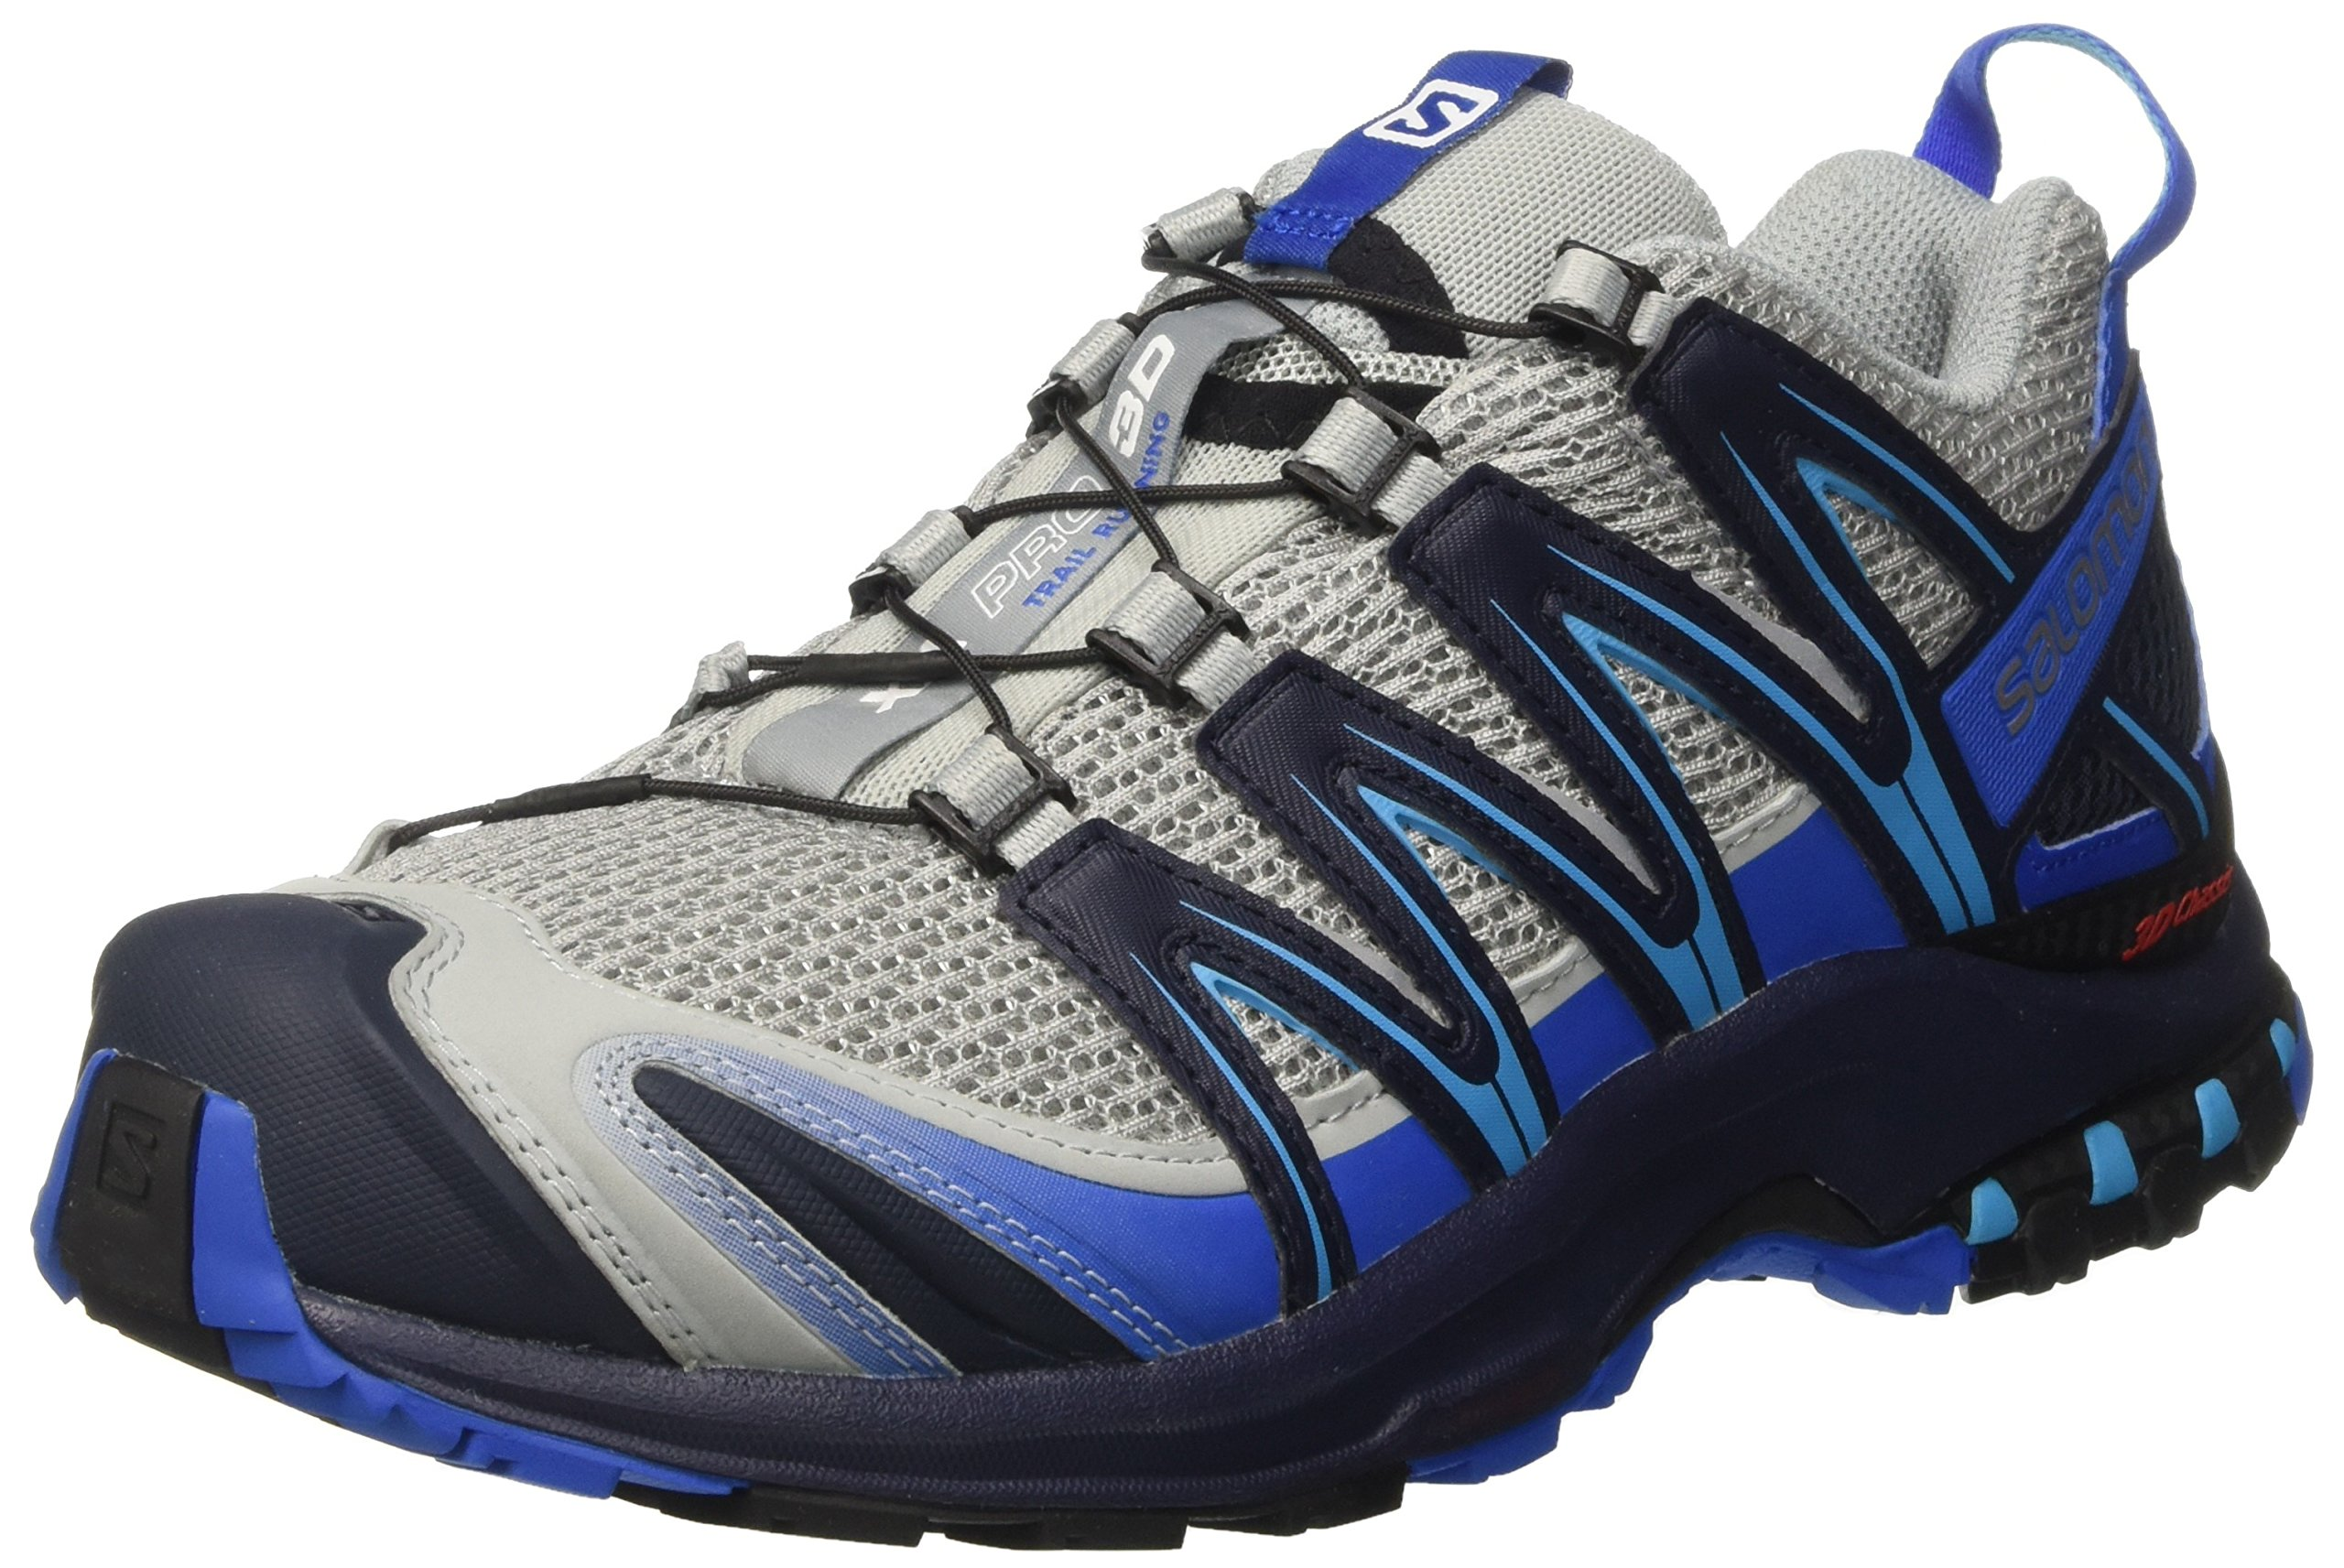 Salomon Men's XA Pro 3D Trail Running Shoes, Quarry/Nautical Blue/Hawaiian Ocean, 7.5 D US